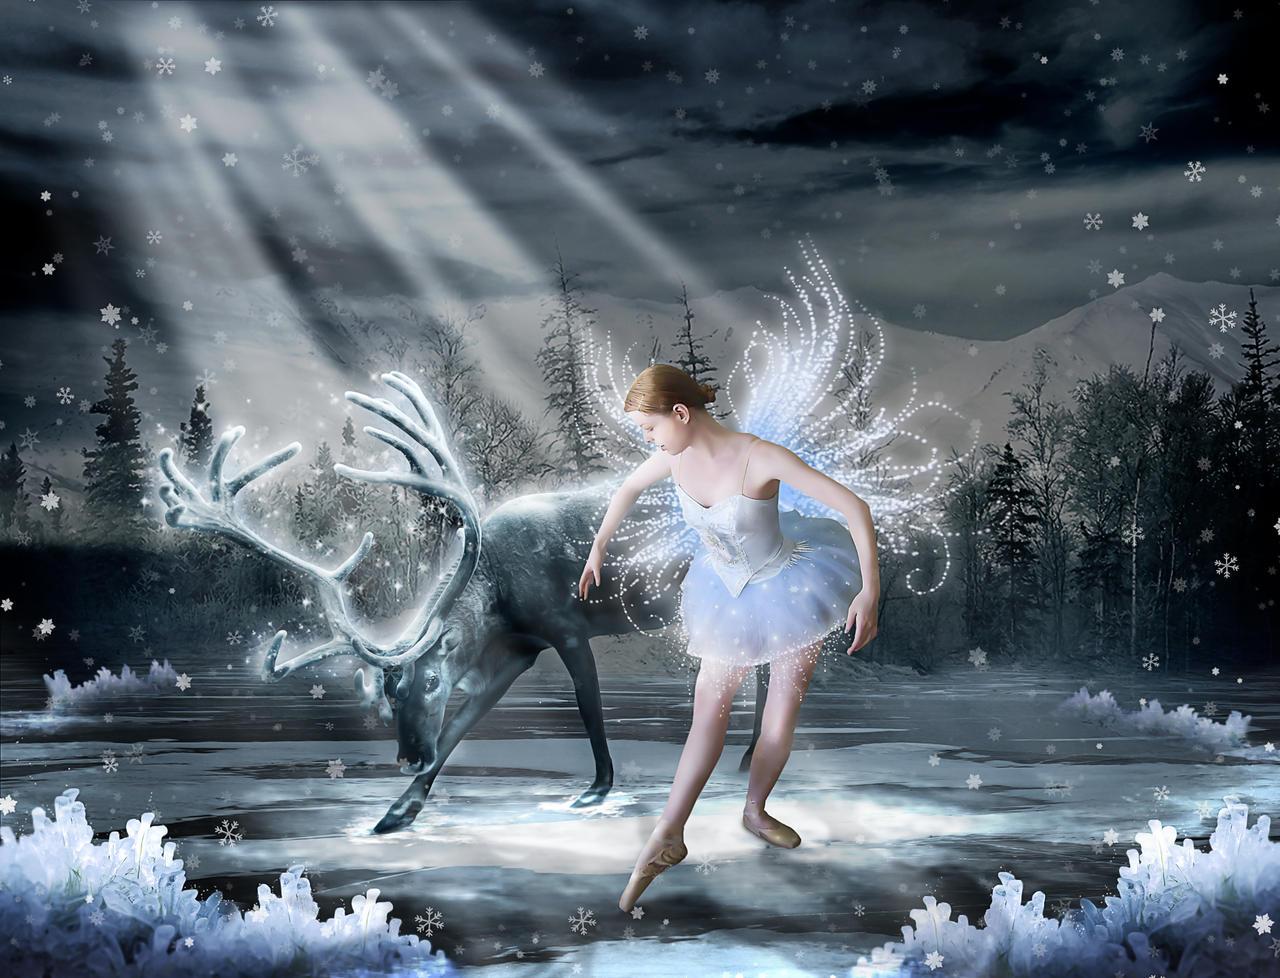 Winter Fairy Tale by Alena-48